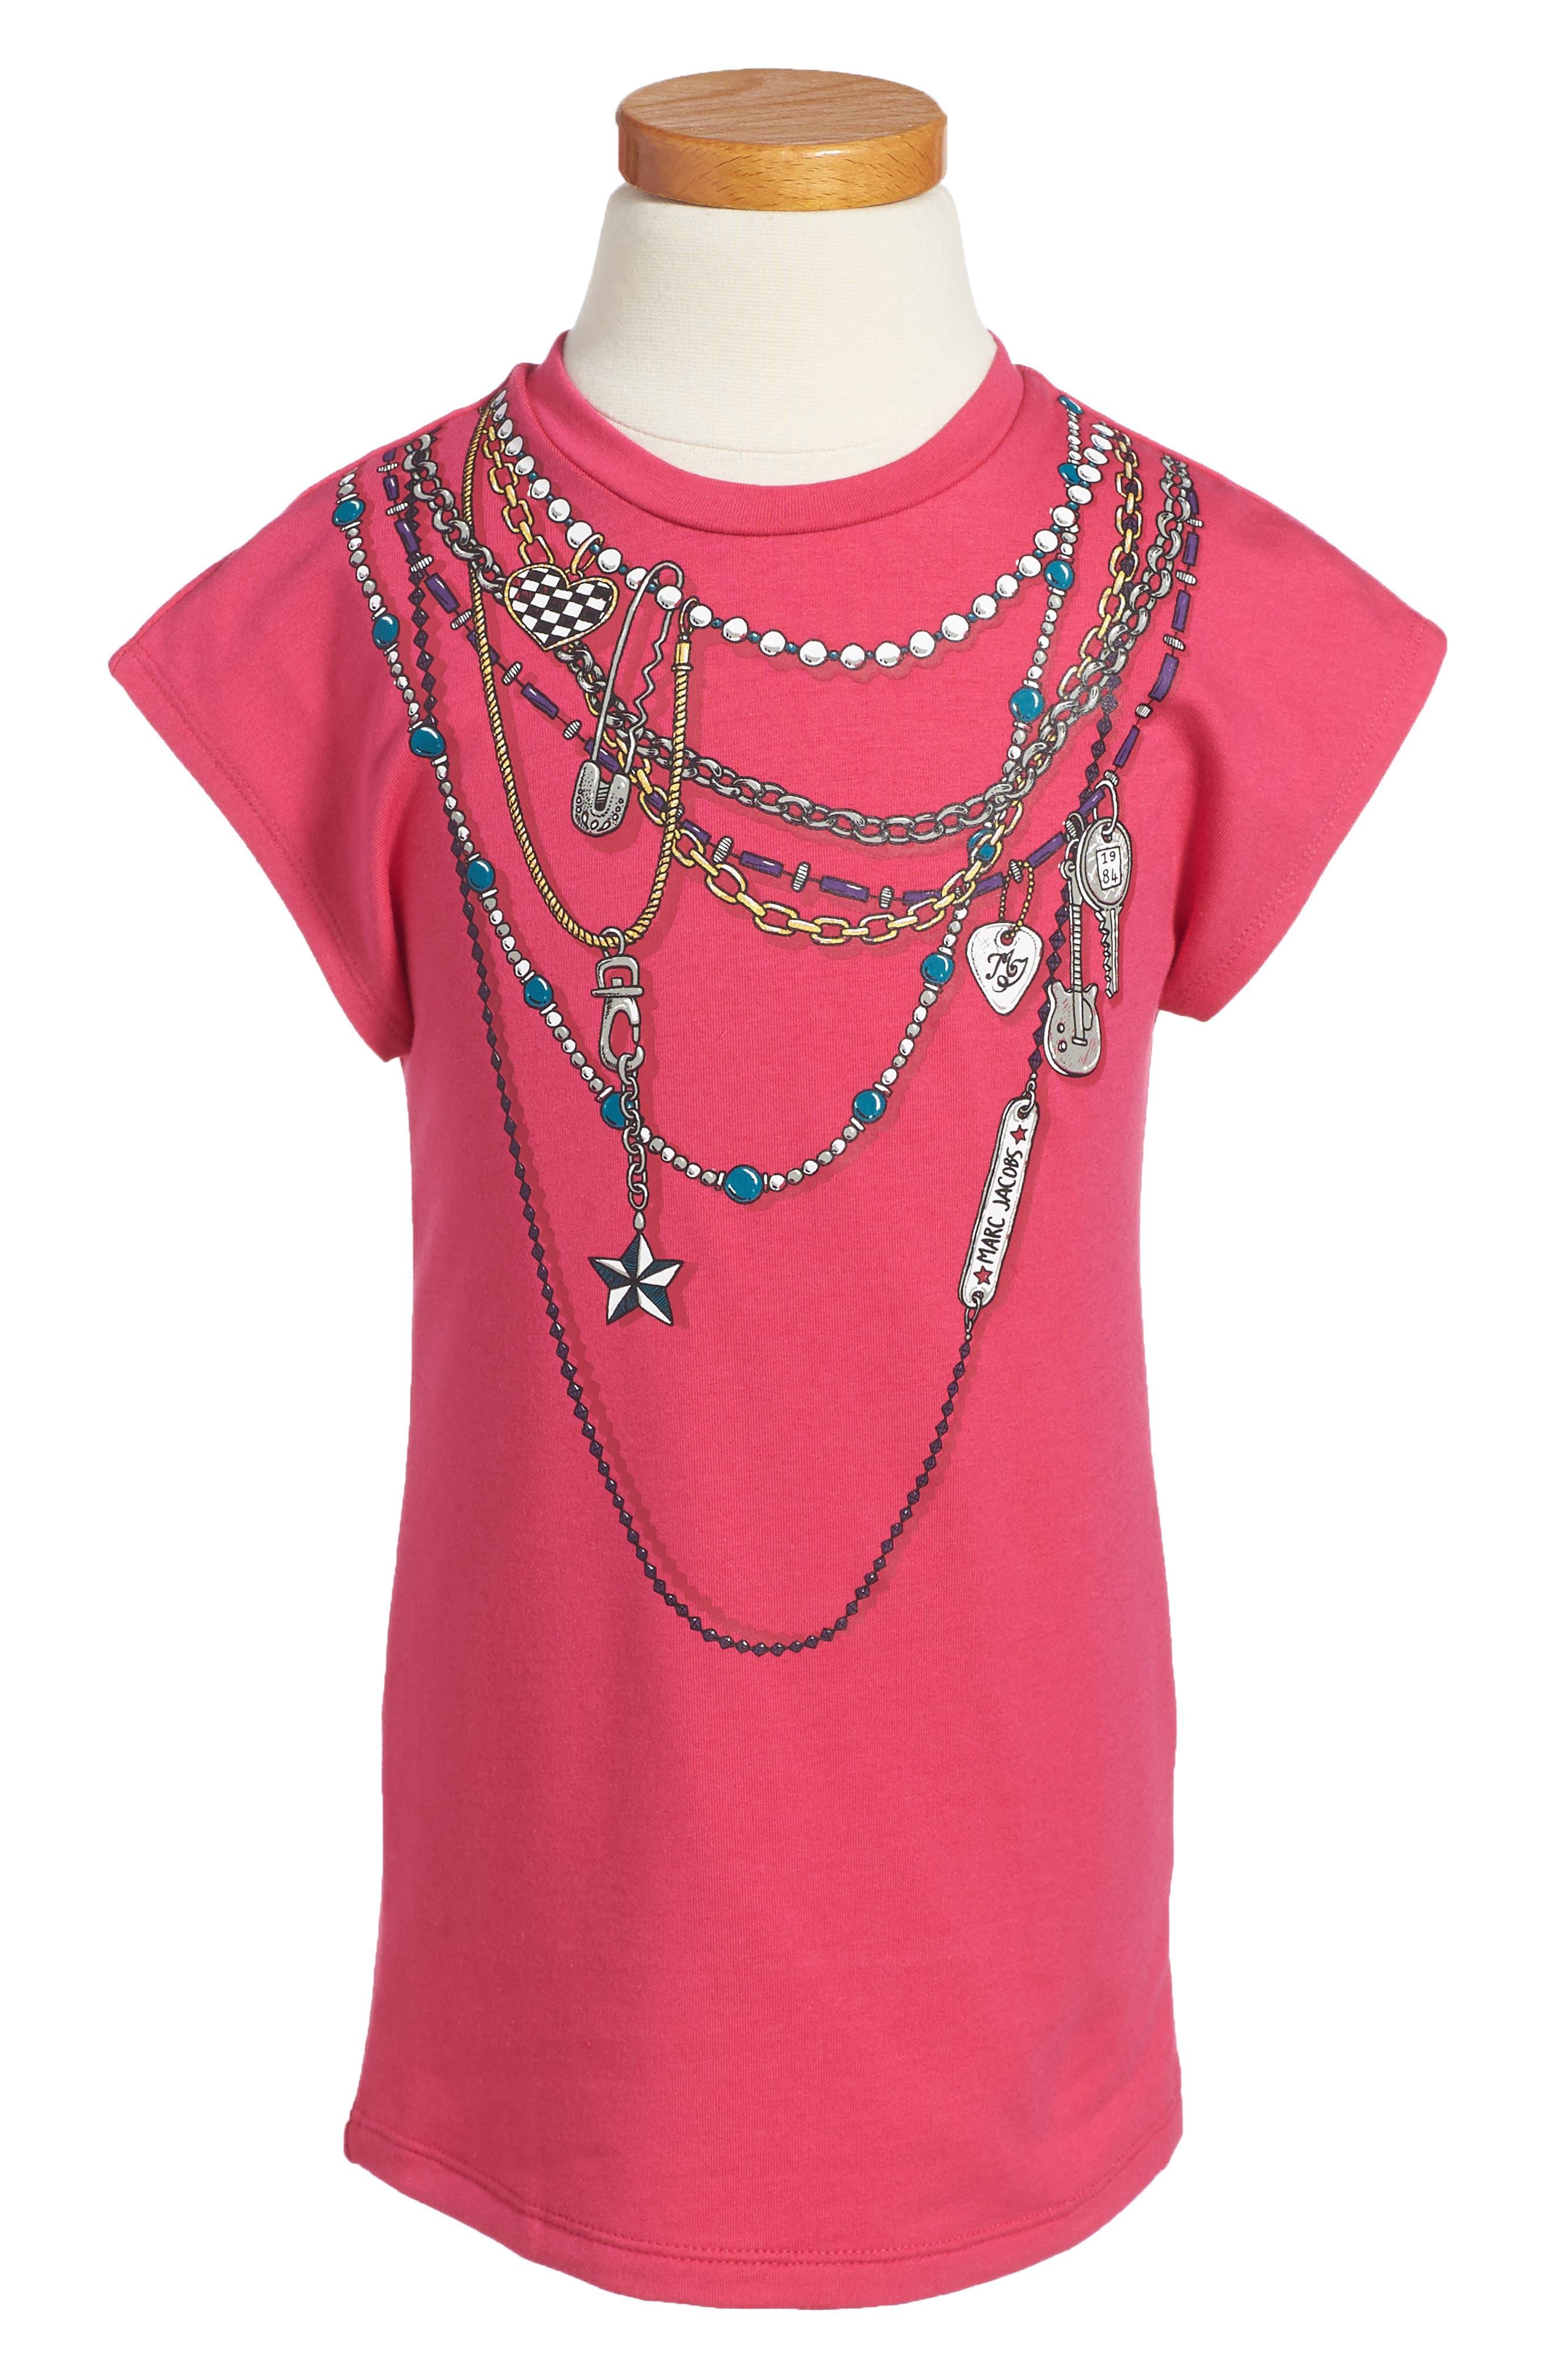 Trompe L'Oeil T-Shirt Dress,                         Main,                         color, Bright Pink